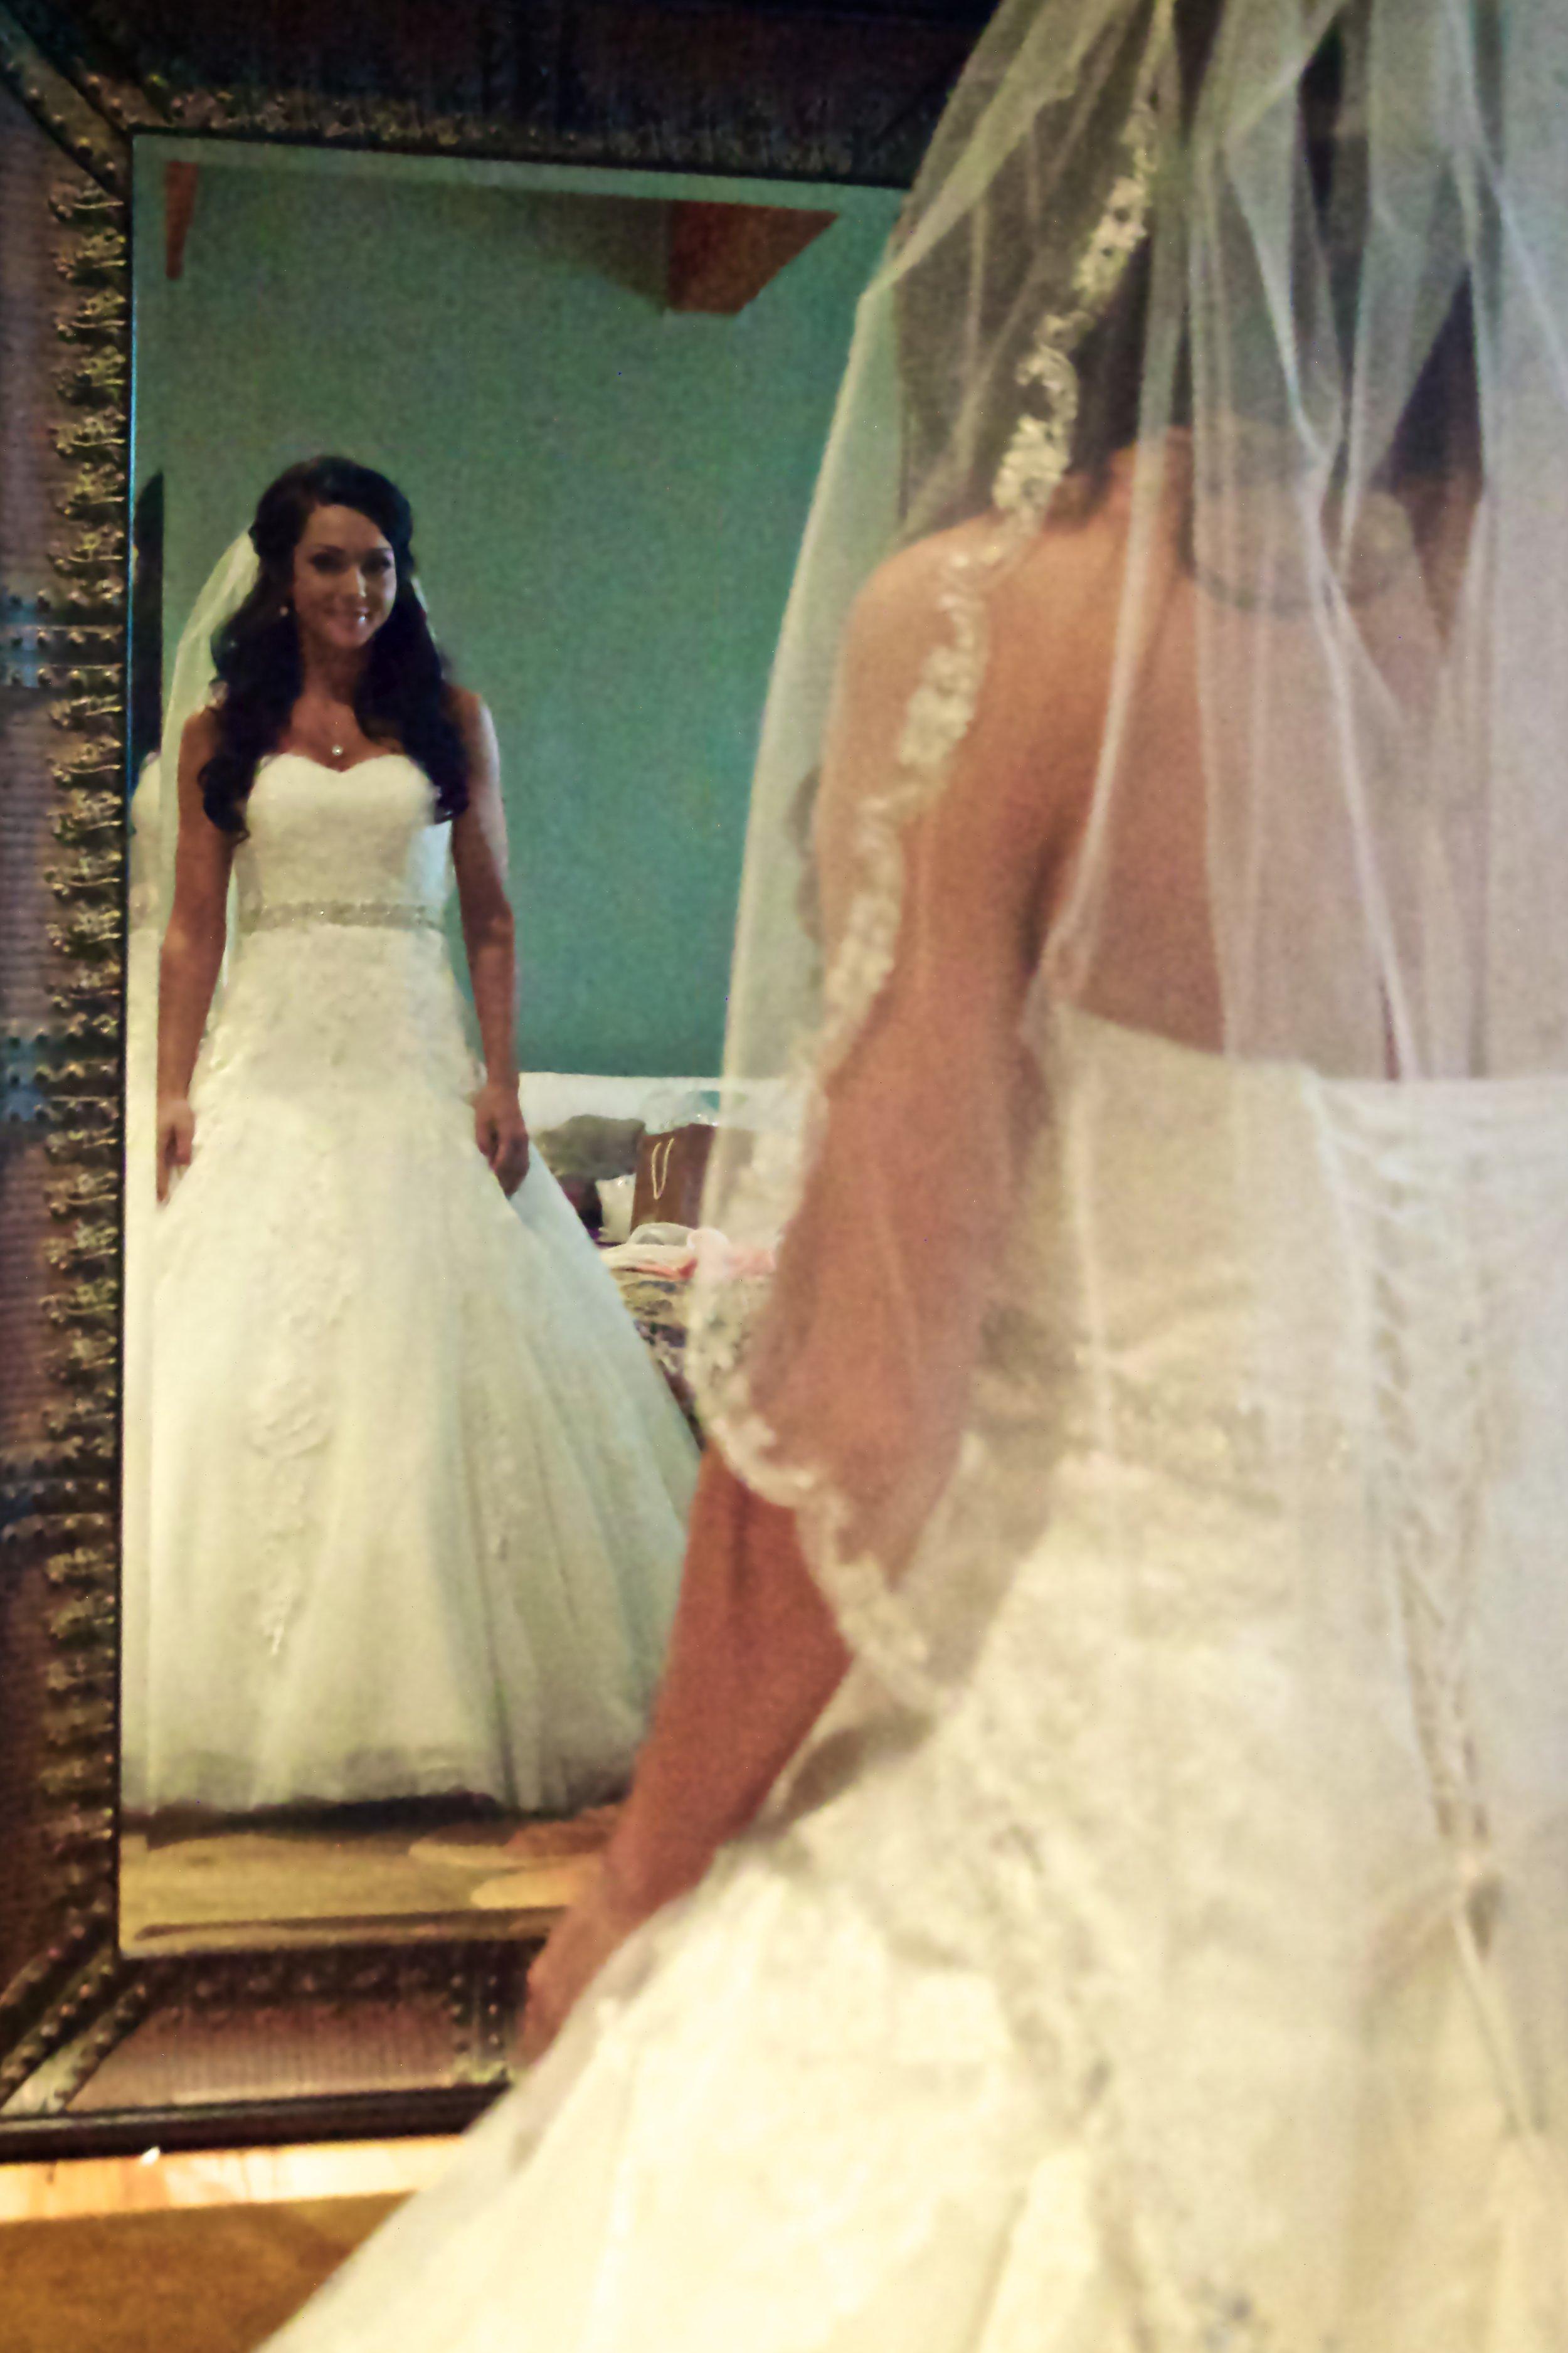 Bride loving her reflection